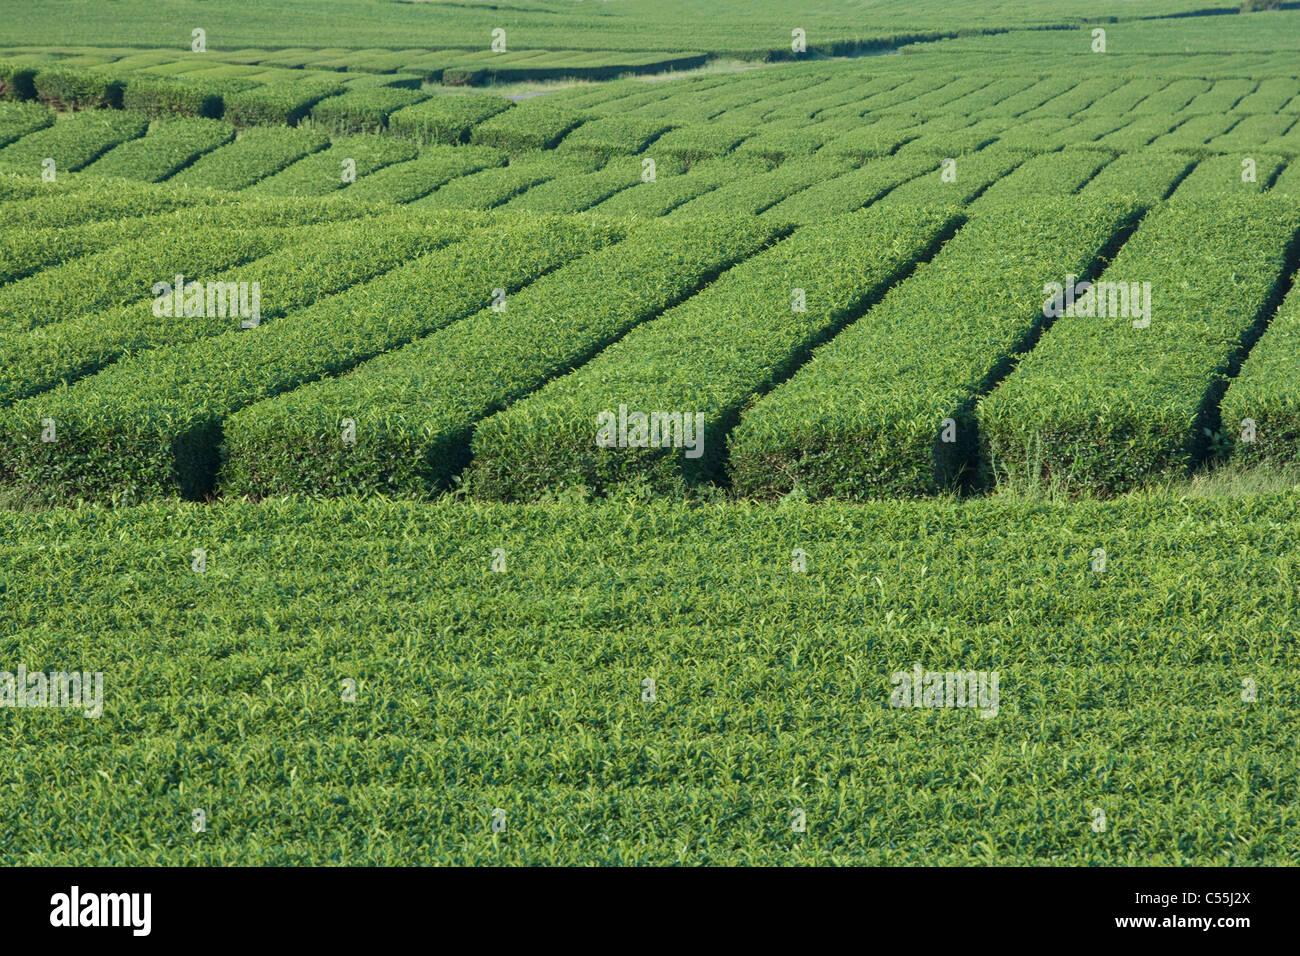 green tea field - Stock Image